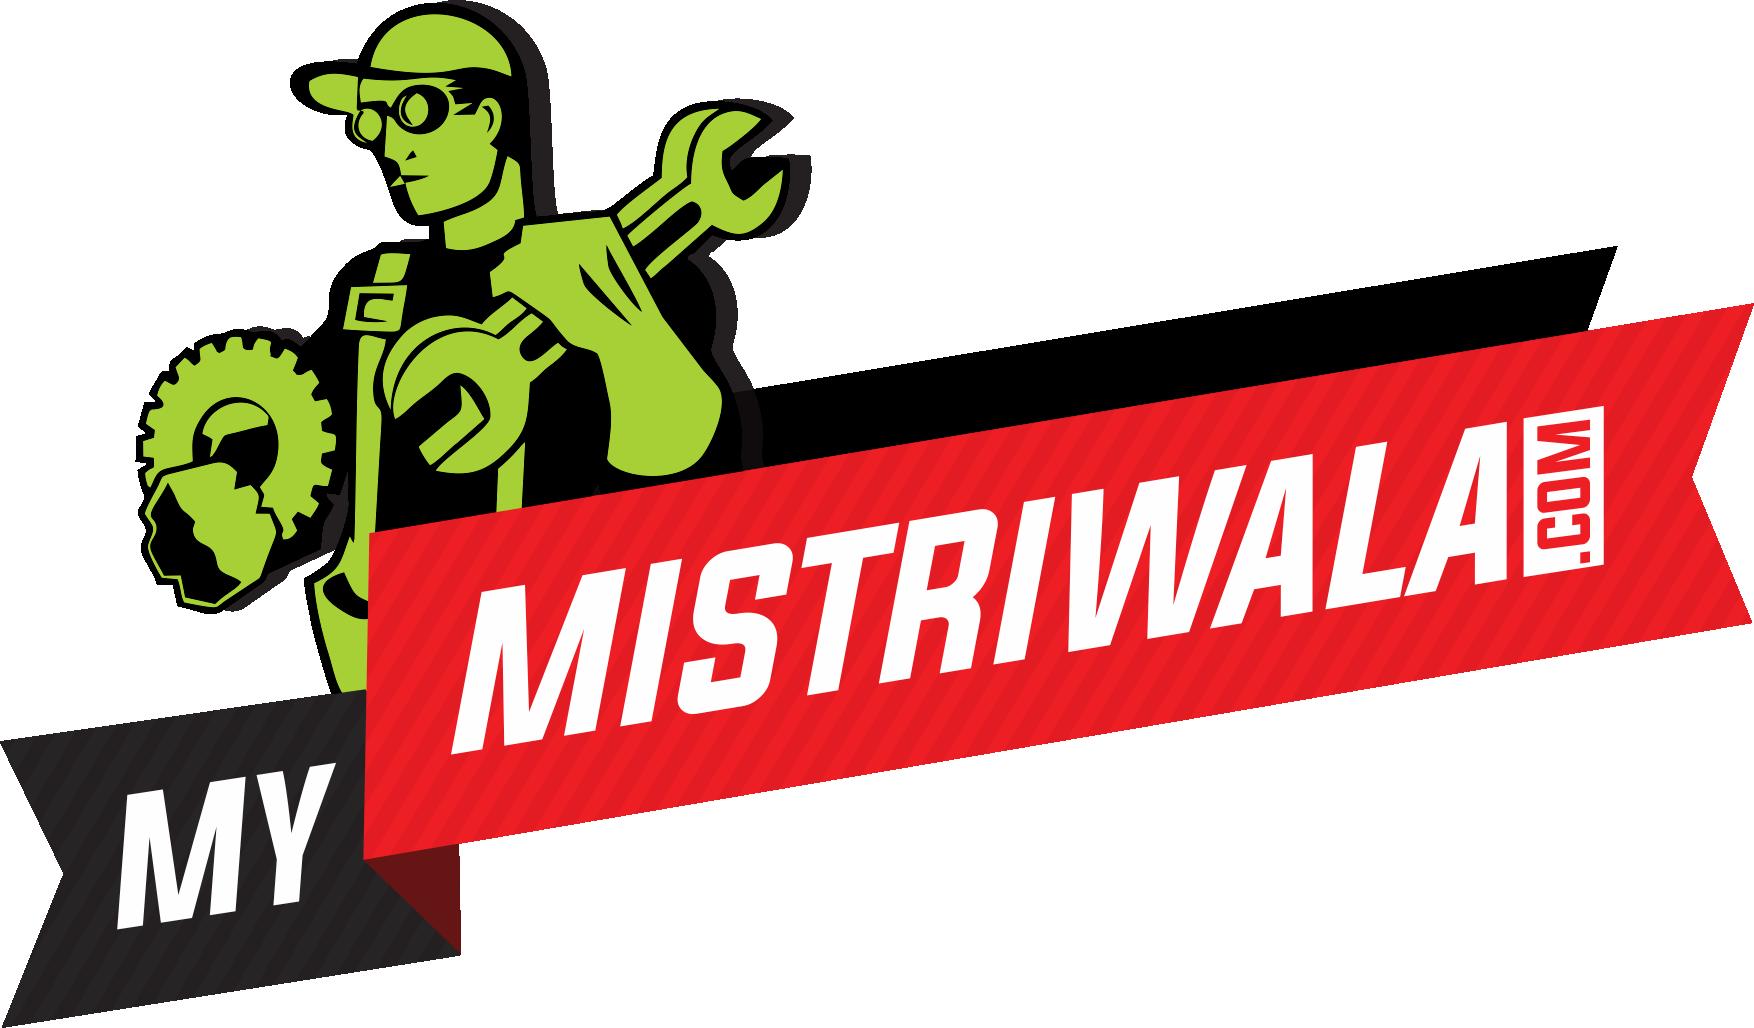 Mymistriwala